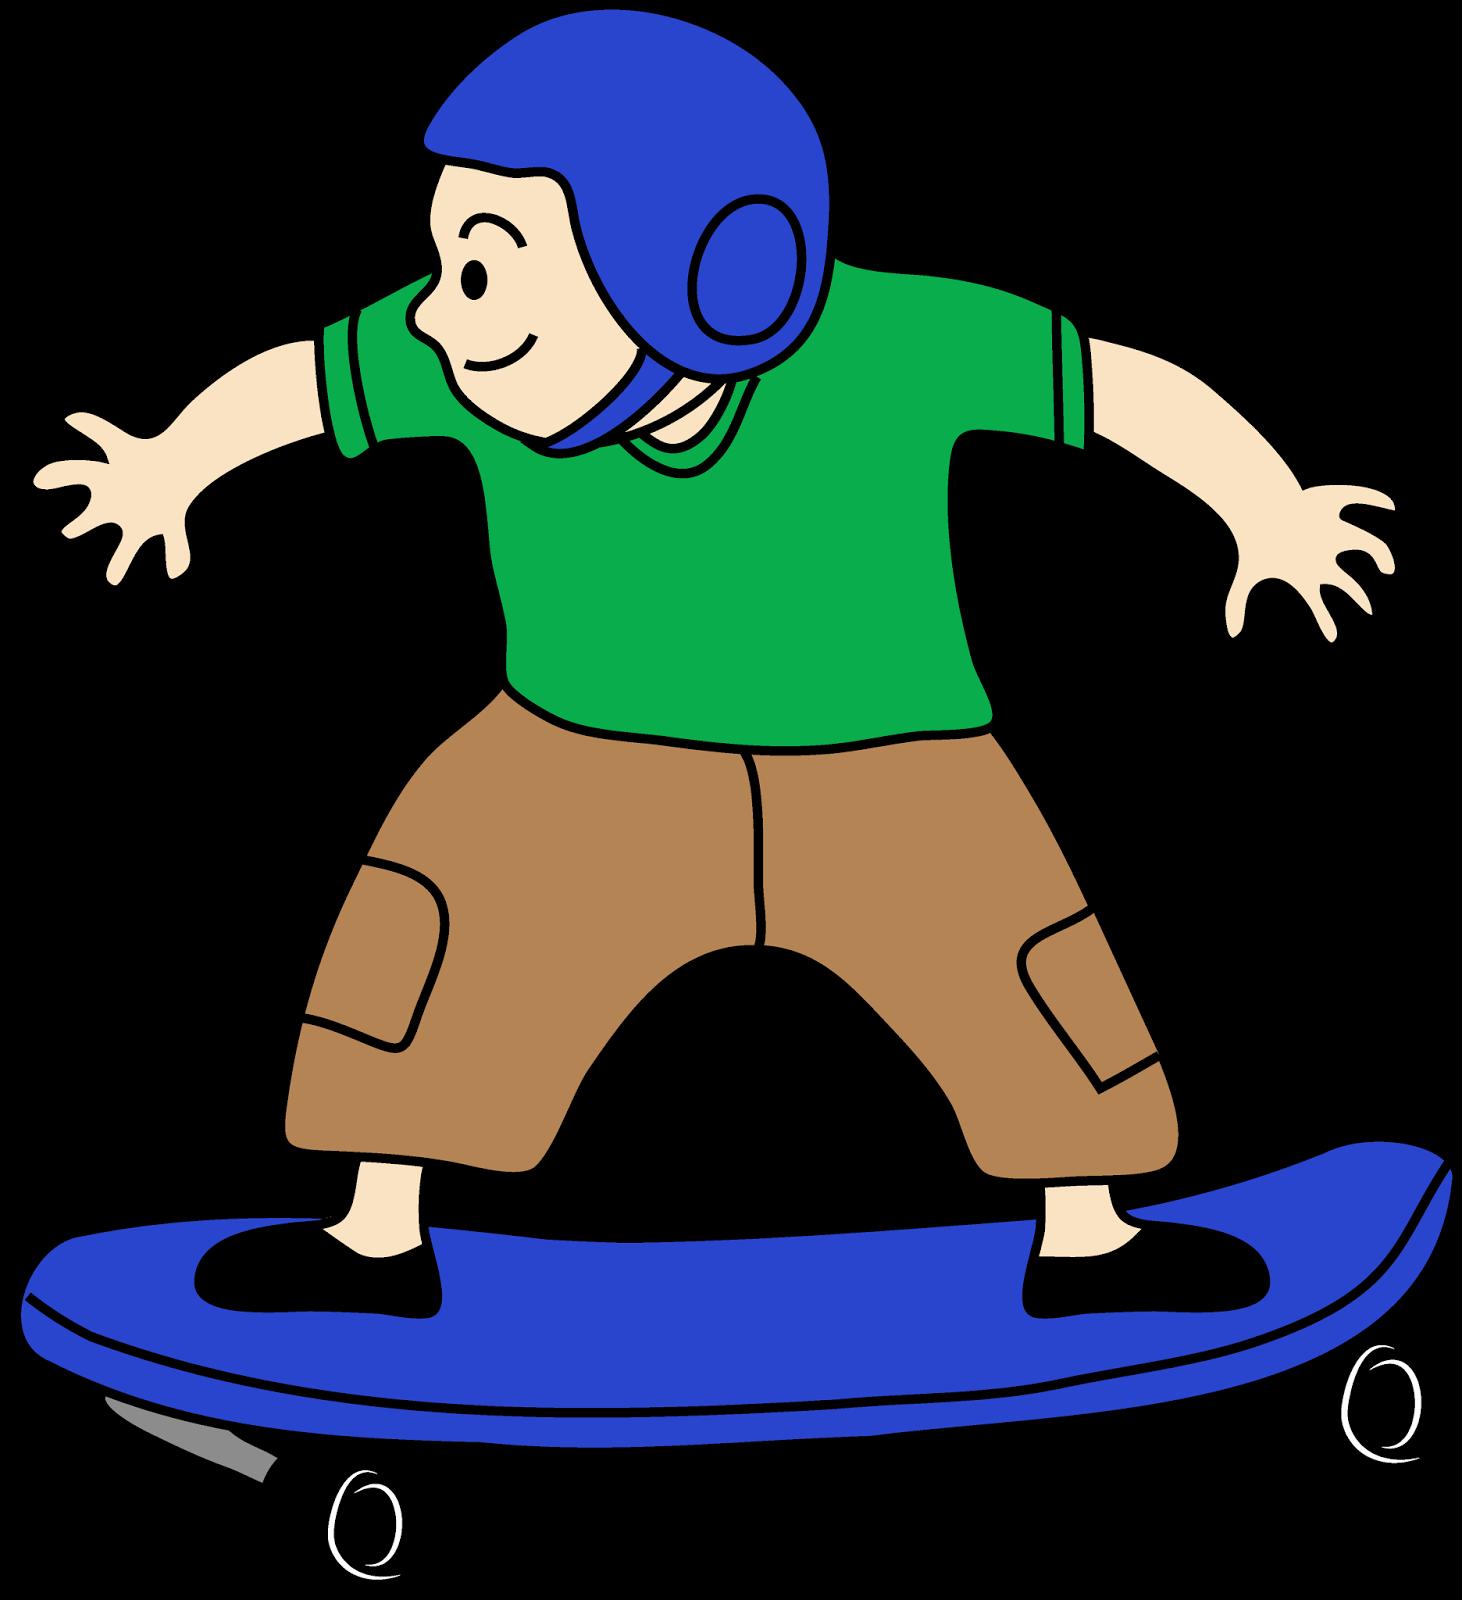 Skateboard anglesic caf january 5 cliparts